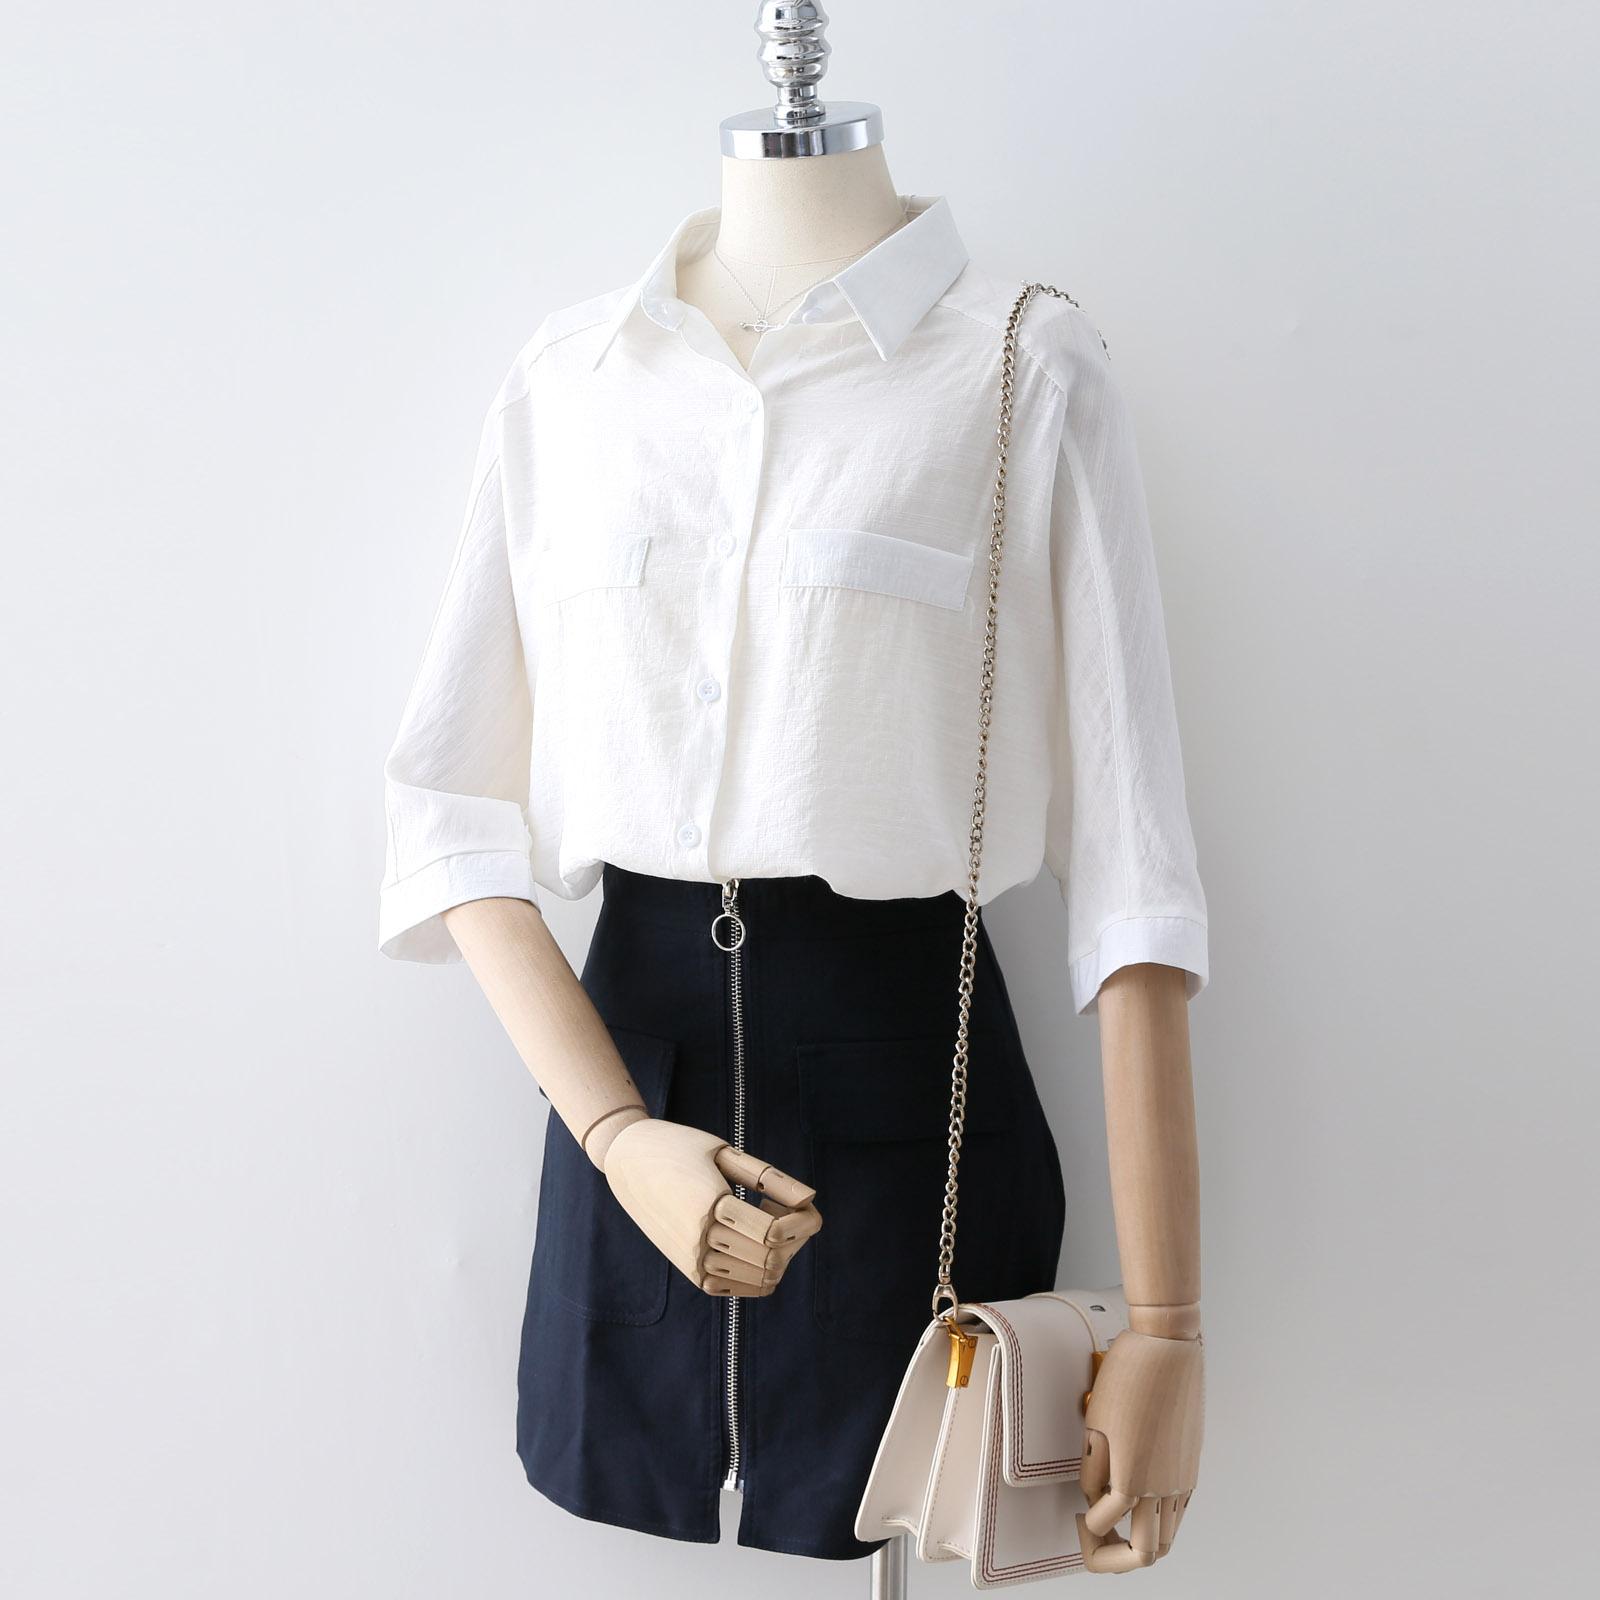 2018夏�b新款�n版中袖�r衫女��松休�e百搭白色棉麻�r衣短袖C892